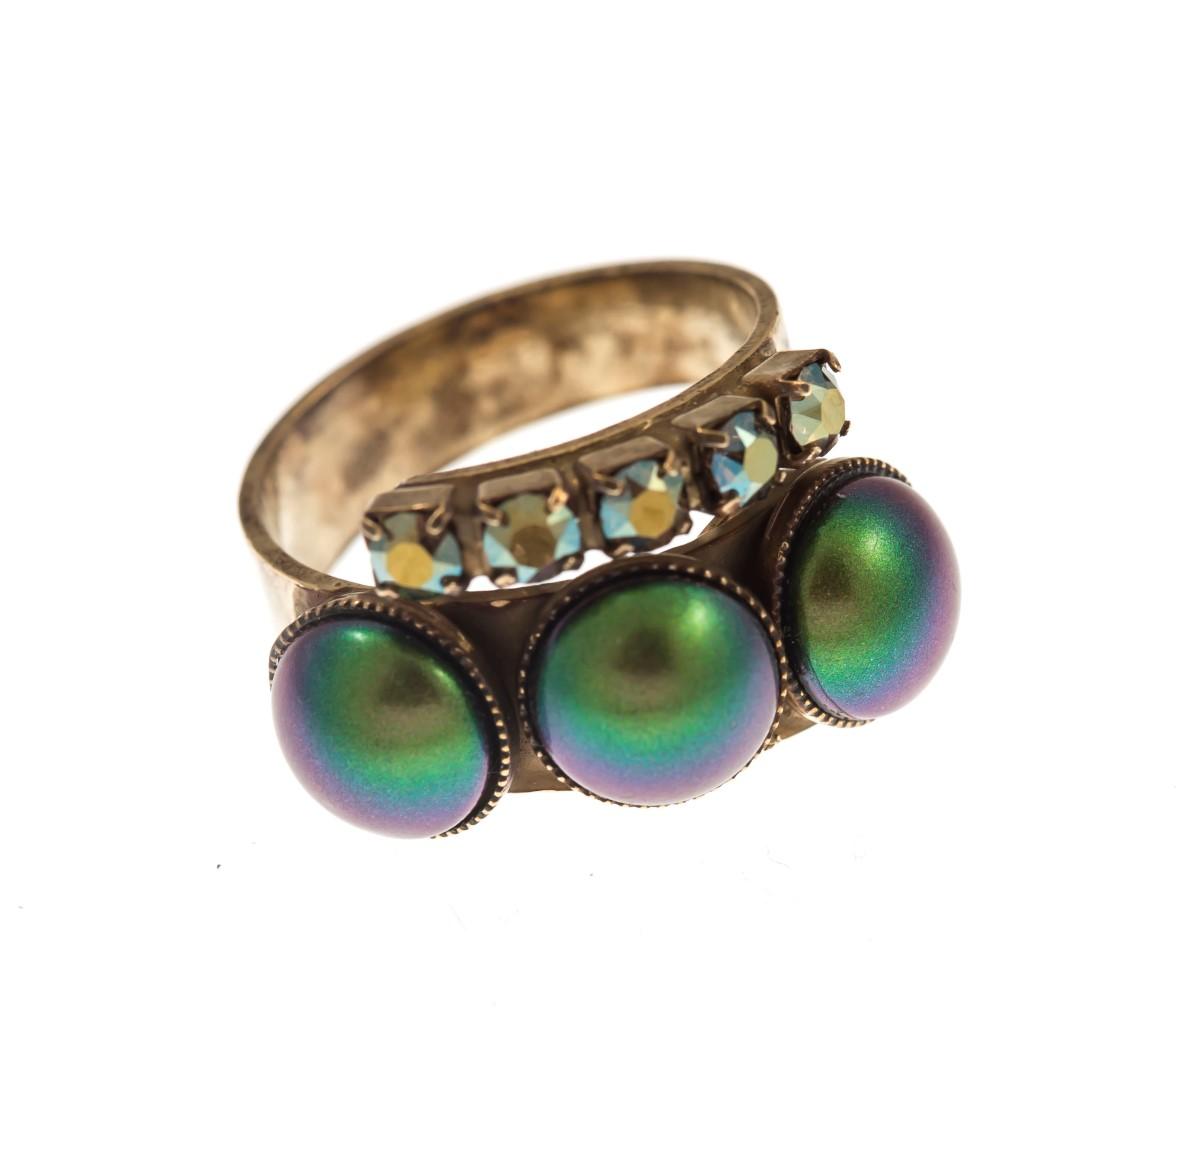 ARTWEAR DIMITRIADIS - Γυναικείο δαχτυλίδι ARTWEAR DIMITRIADIS με στρας και πέρλε γυναικεία αξεσουάρ κοσμήματα δαχτυλίδια